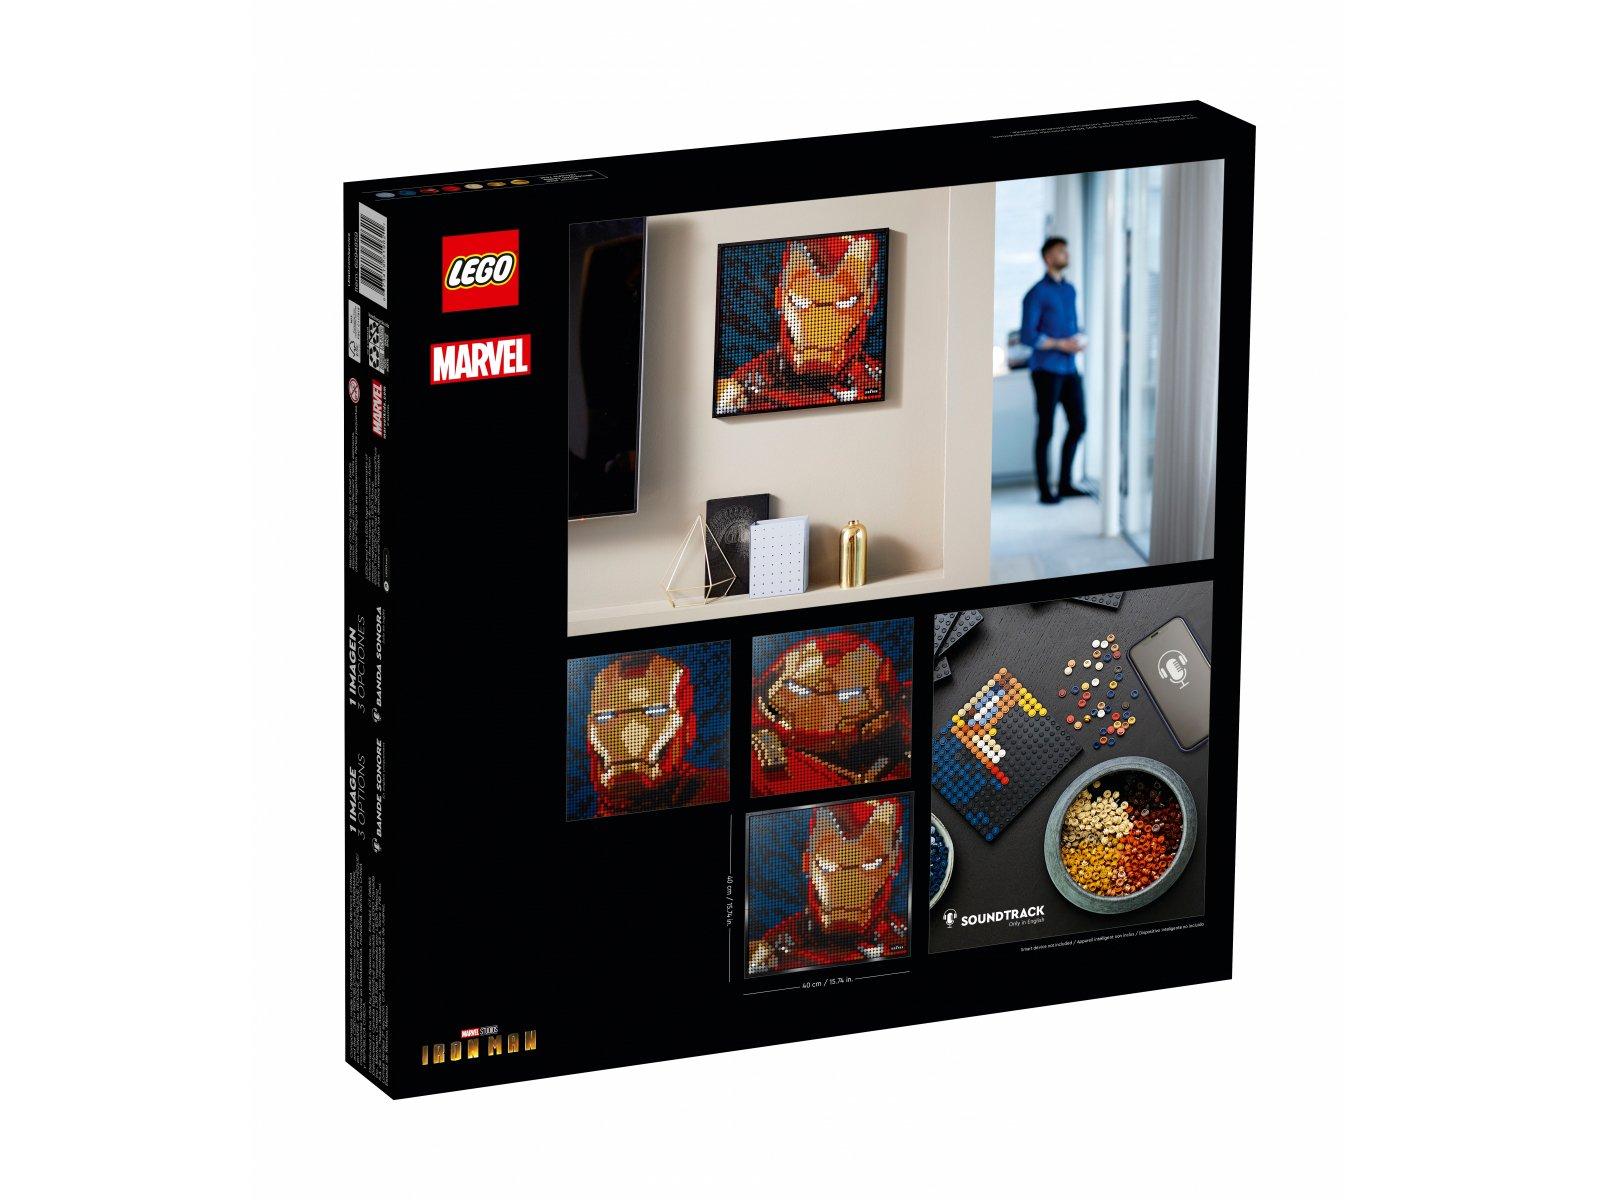 LEGO 31199 Art Iron Man z wytwórni Marvel Studios